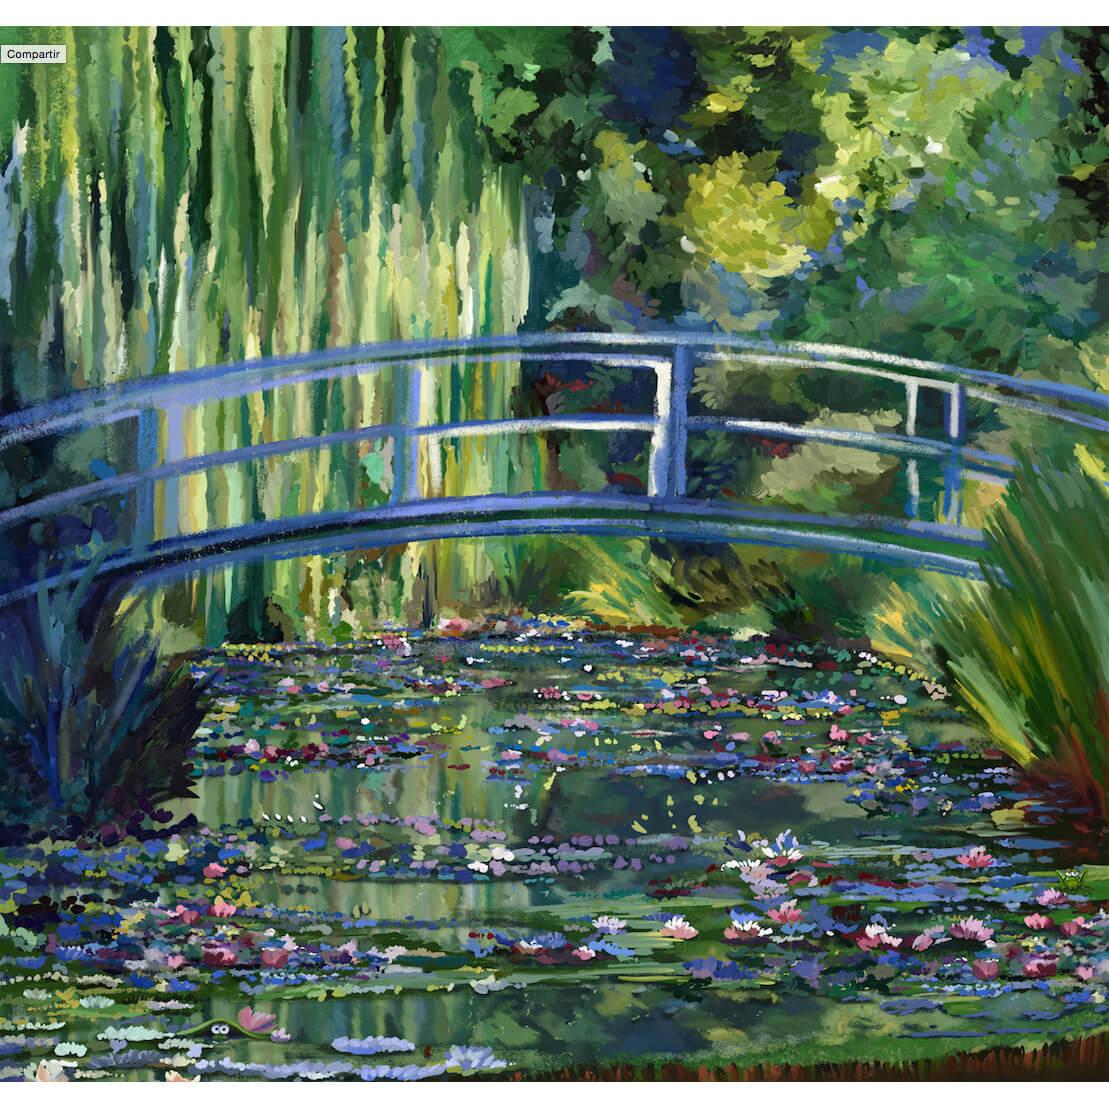 """Nenúfares"" de Agustín Lorés. Adaptación reimaginada de la obra de Monet"